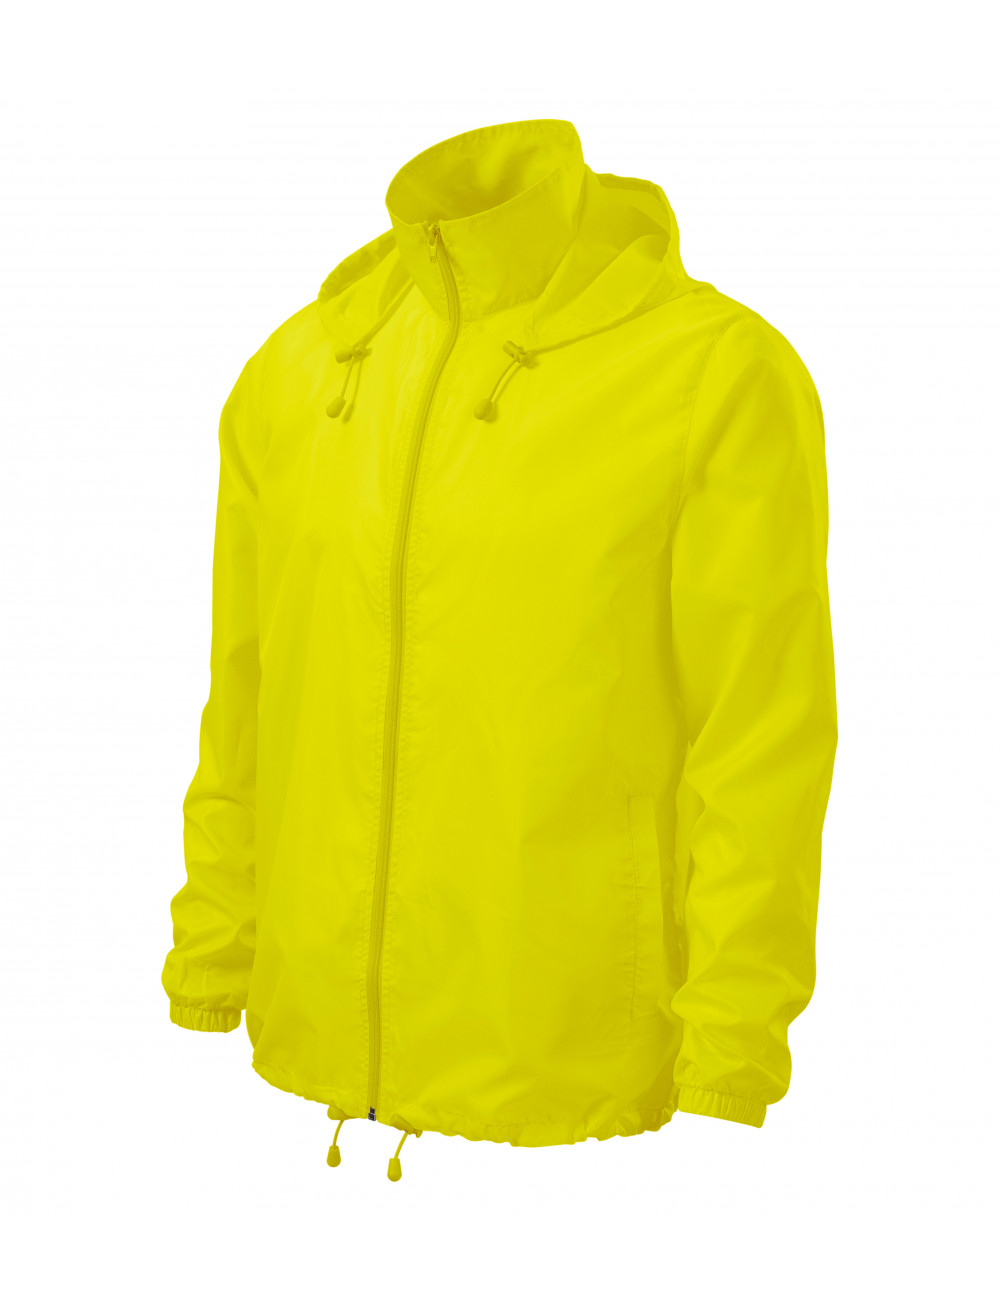 Adler MALFINI Wiatrówka unisex Windy 524 neon yellow